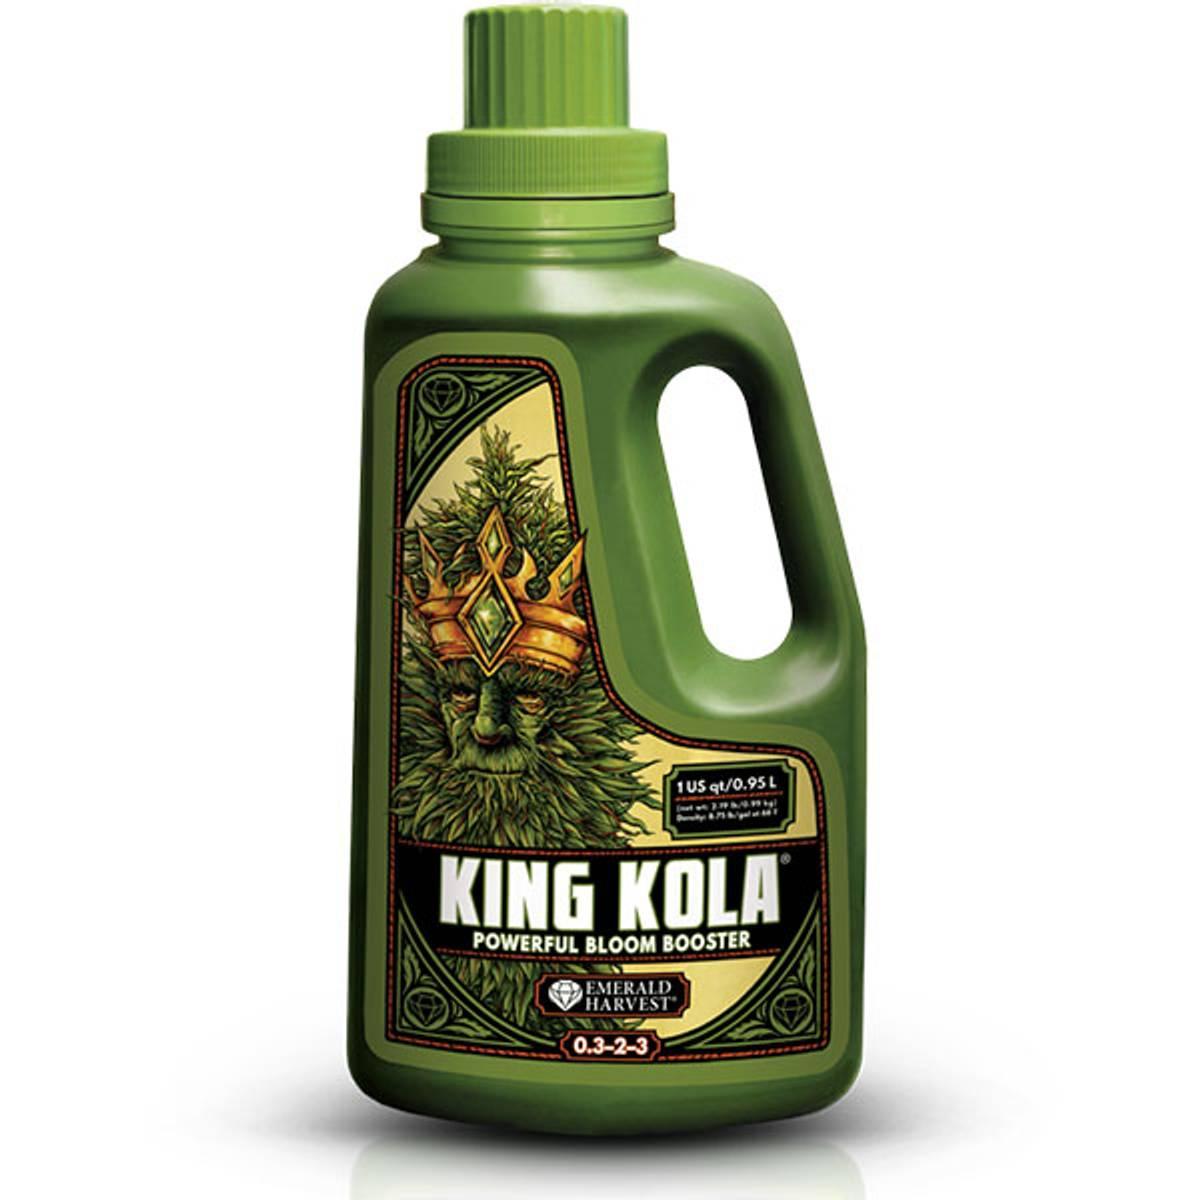 King Kola 0,95 L, Emerald Harvest